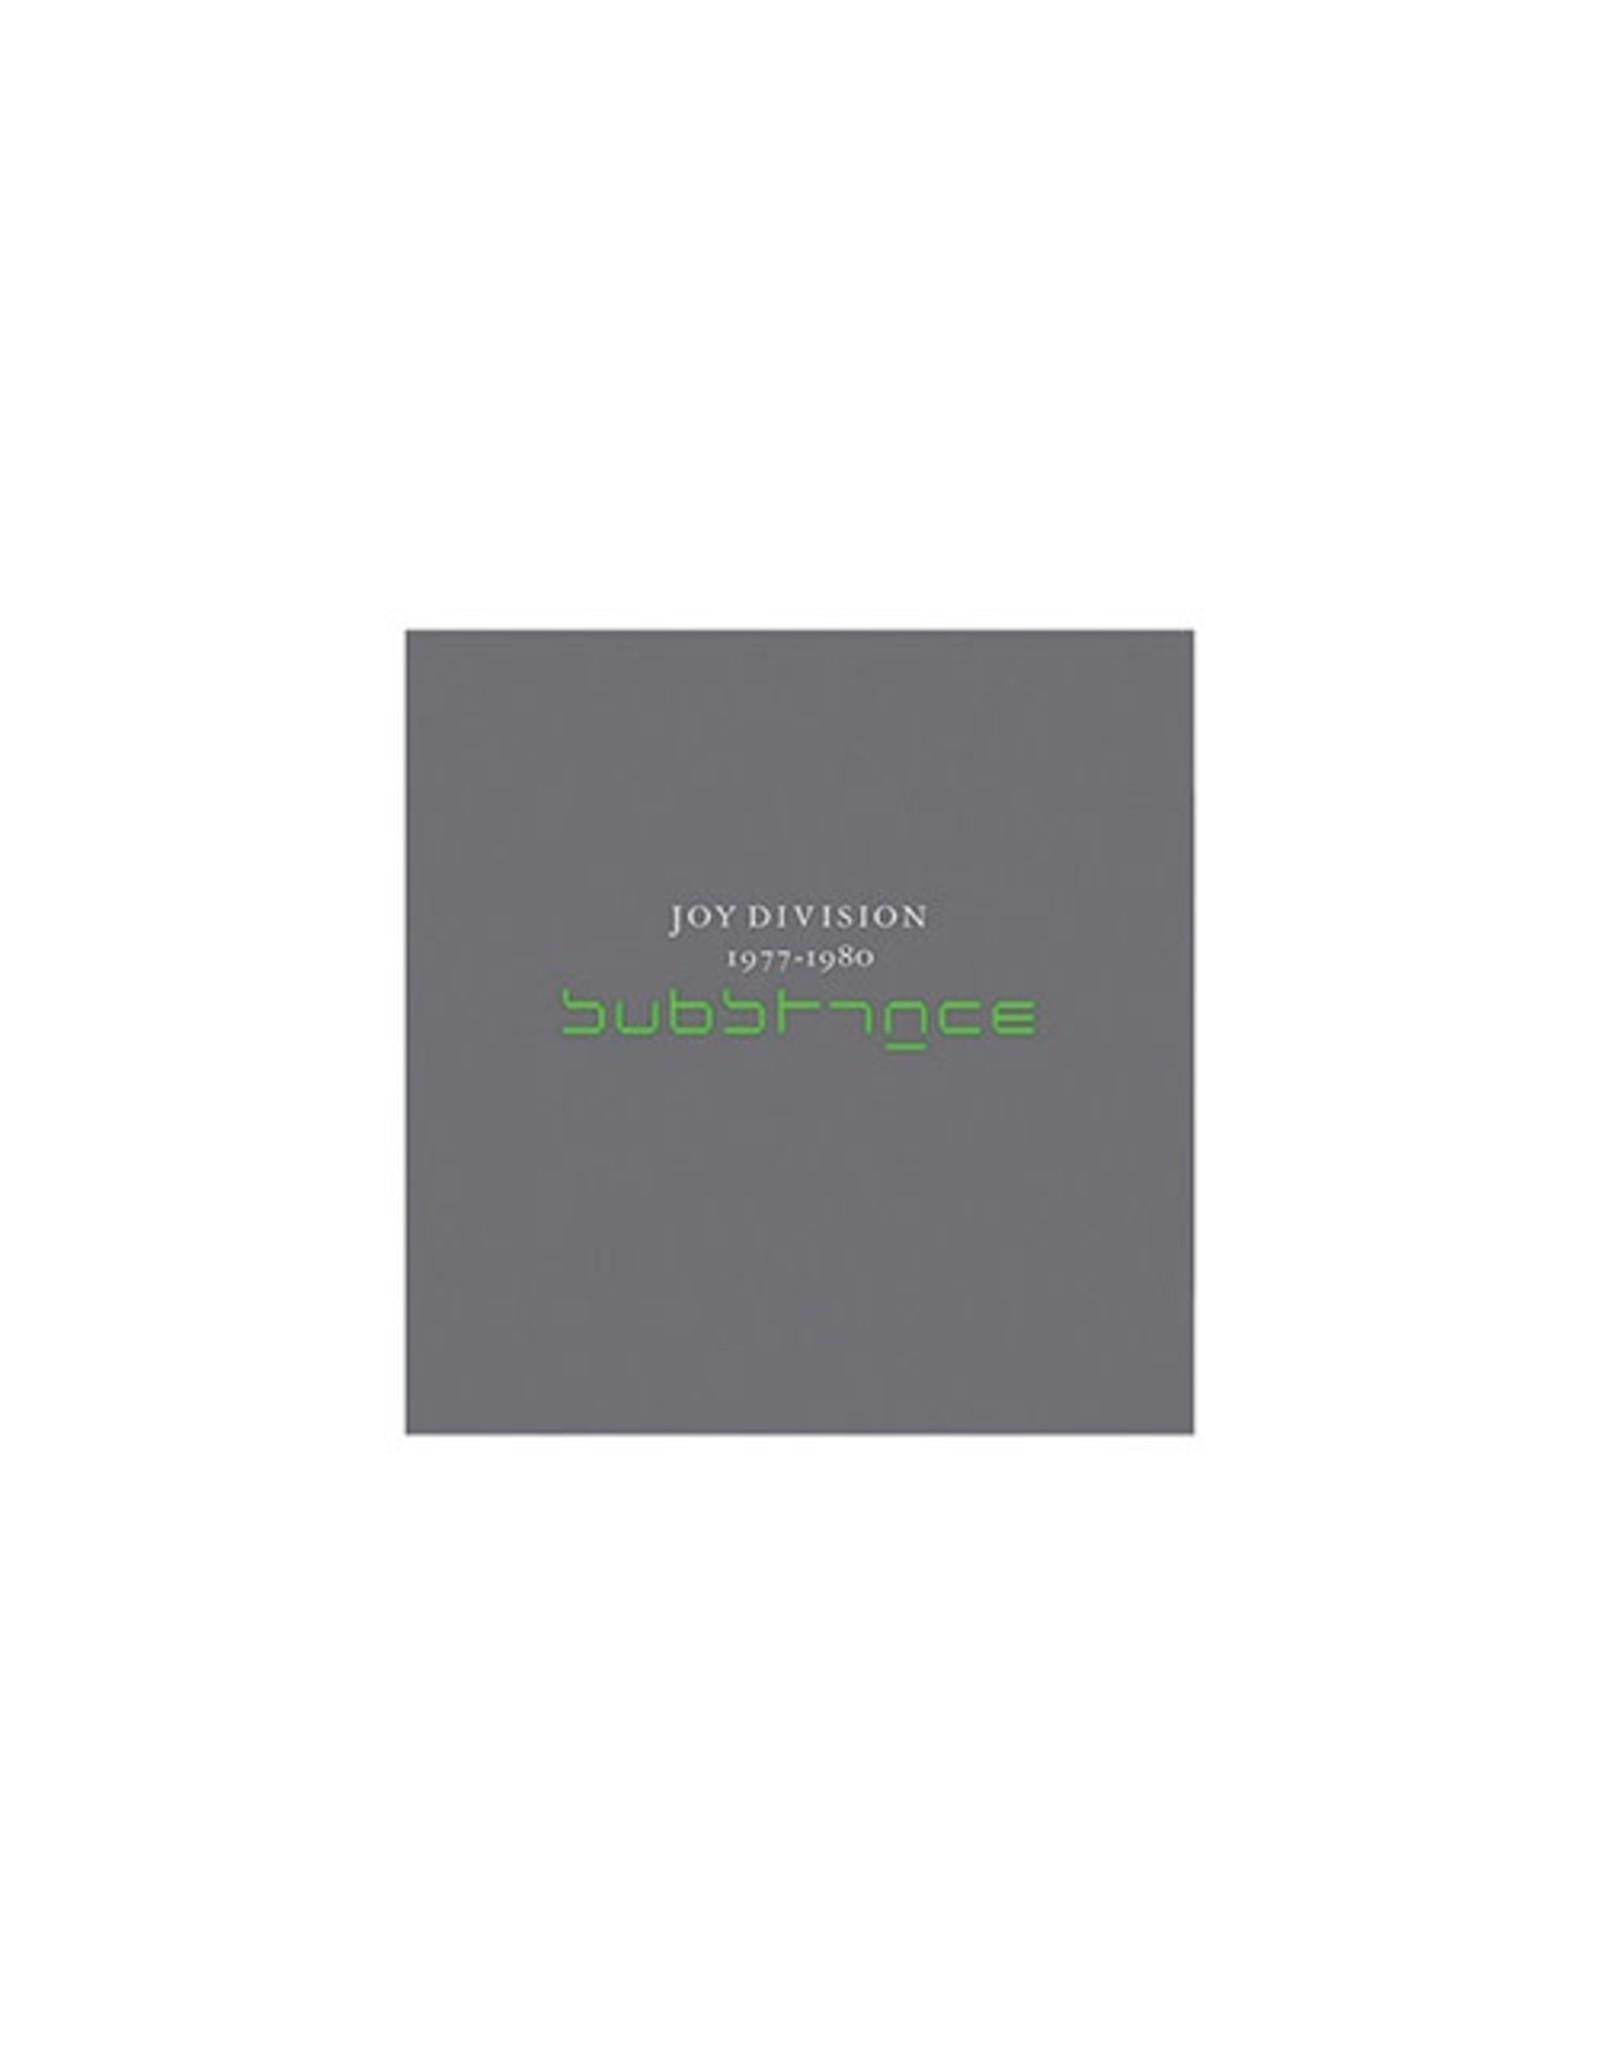 Rhino Joy Division: Substance LP